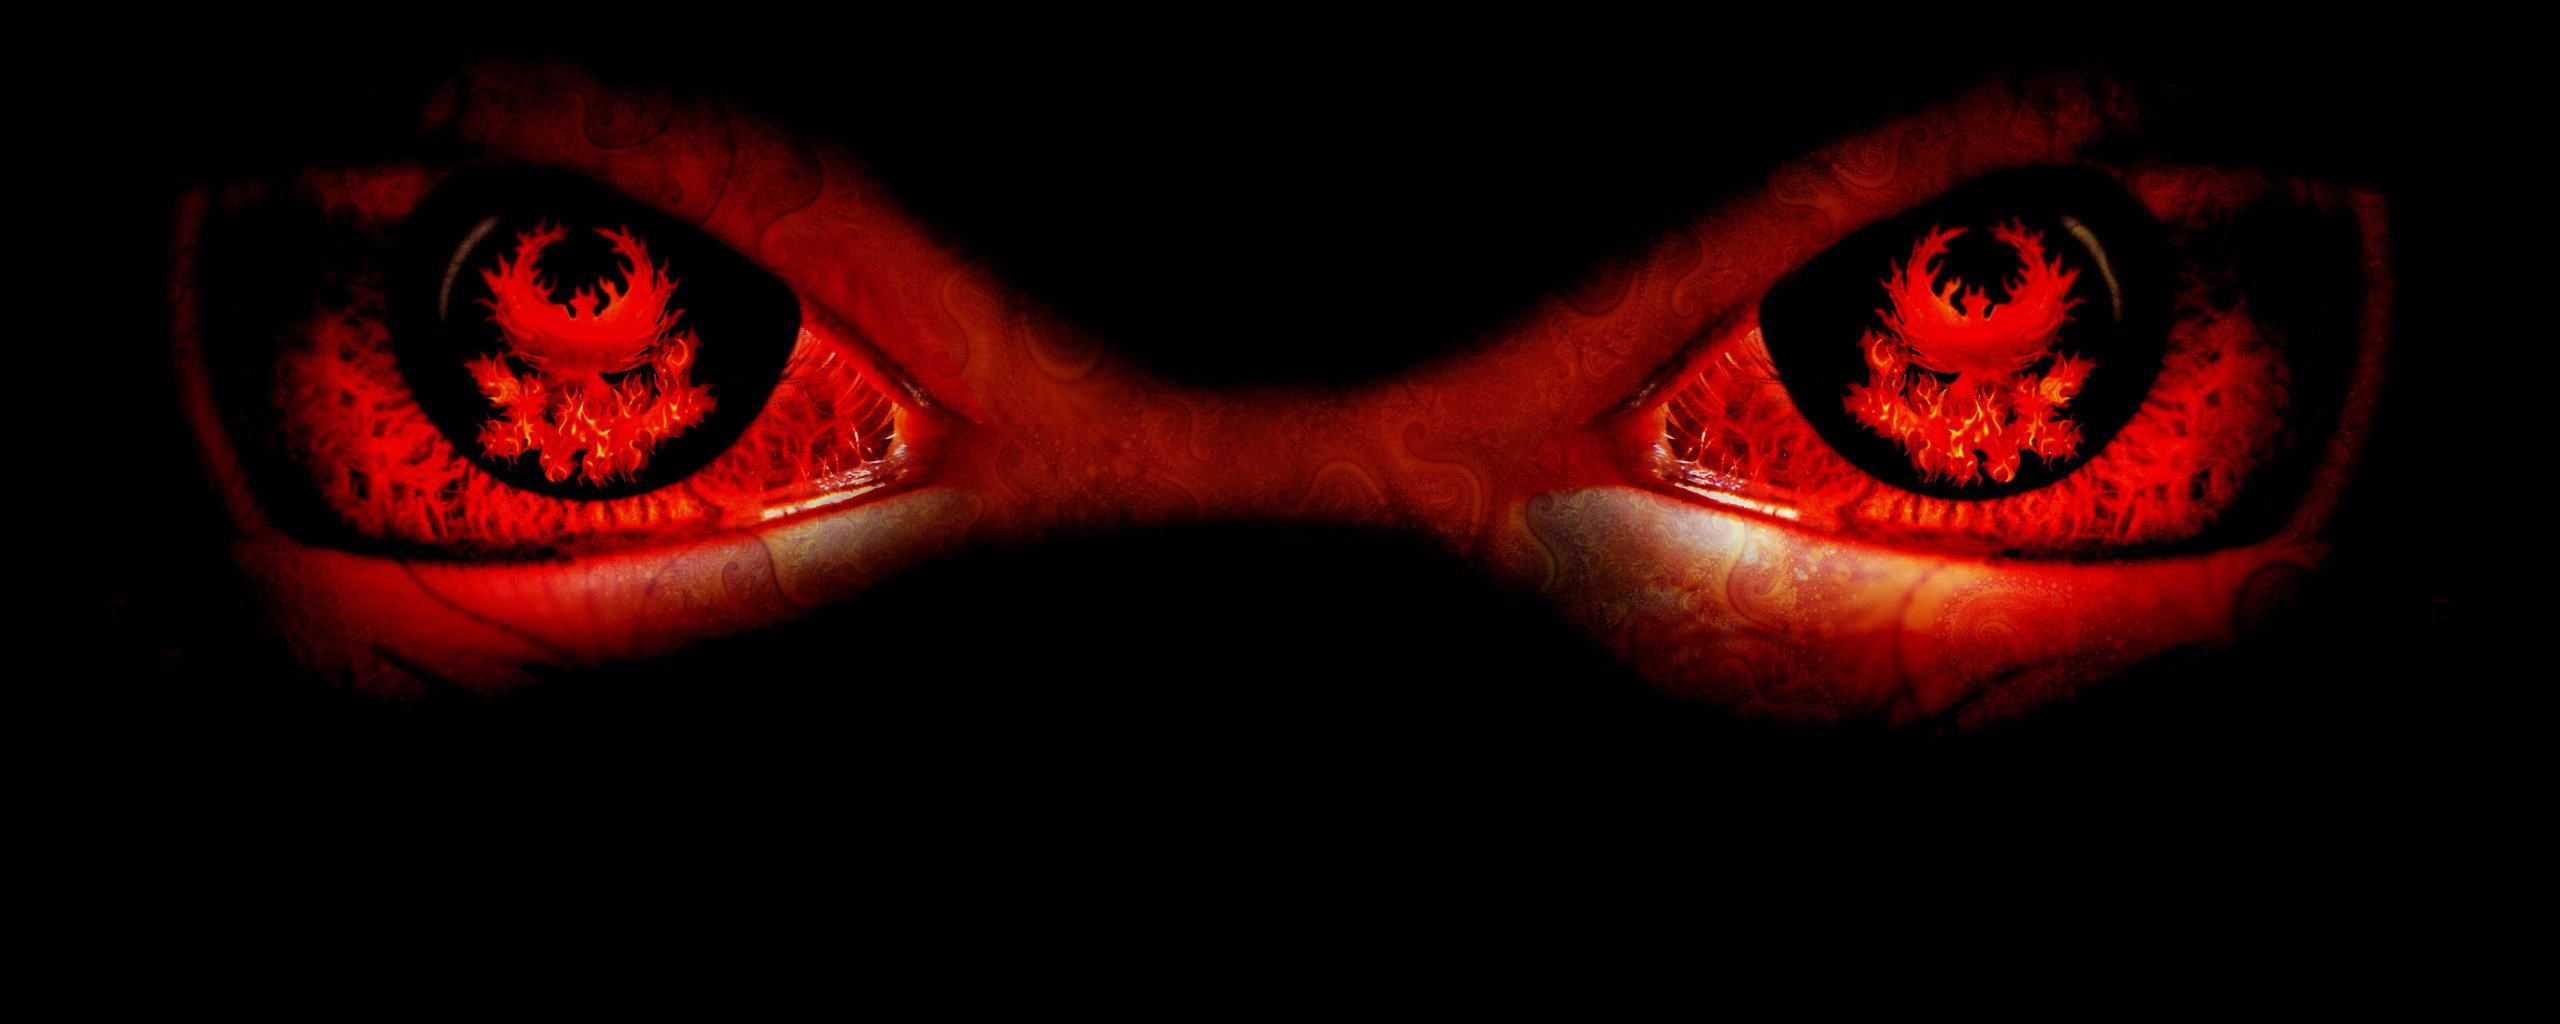 Evil eyes photo